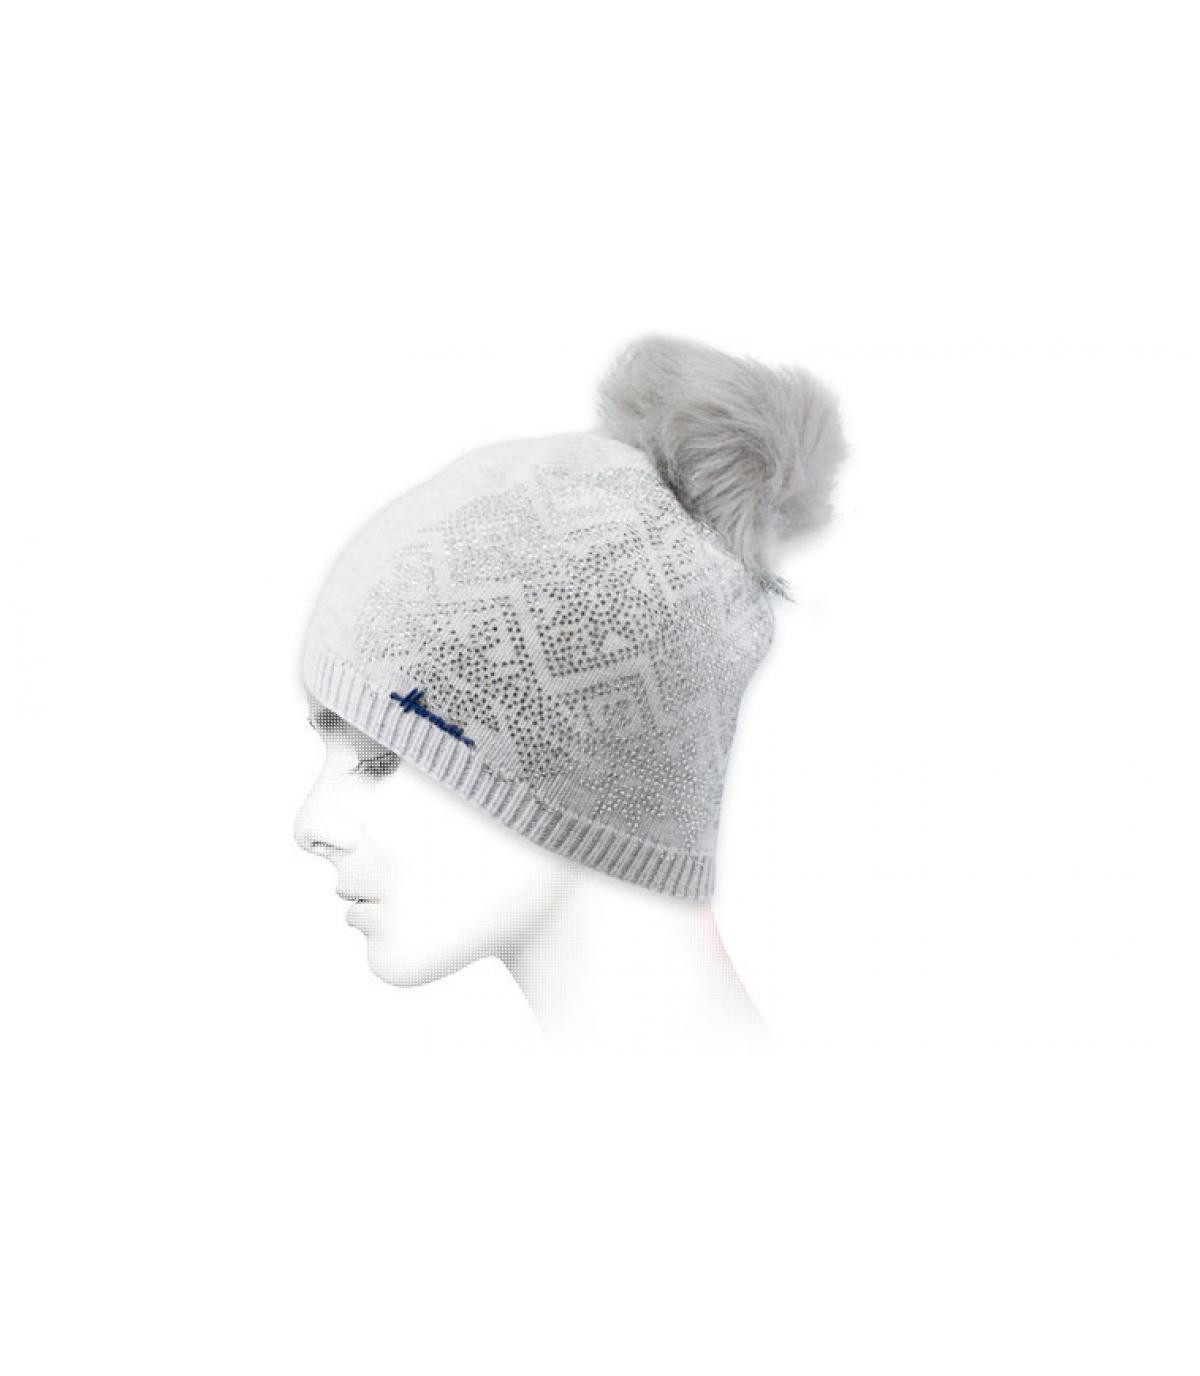 strass bonnet blu cielo